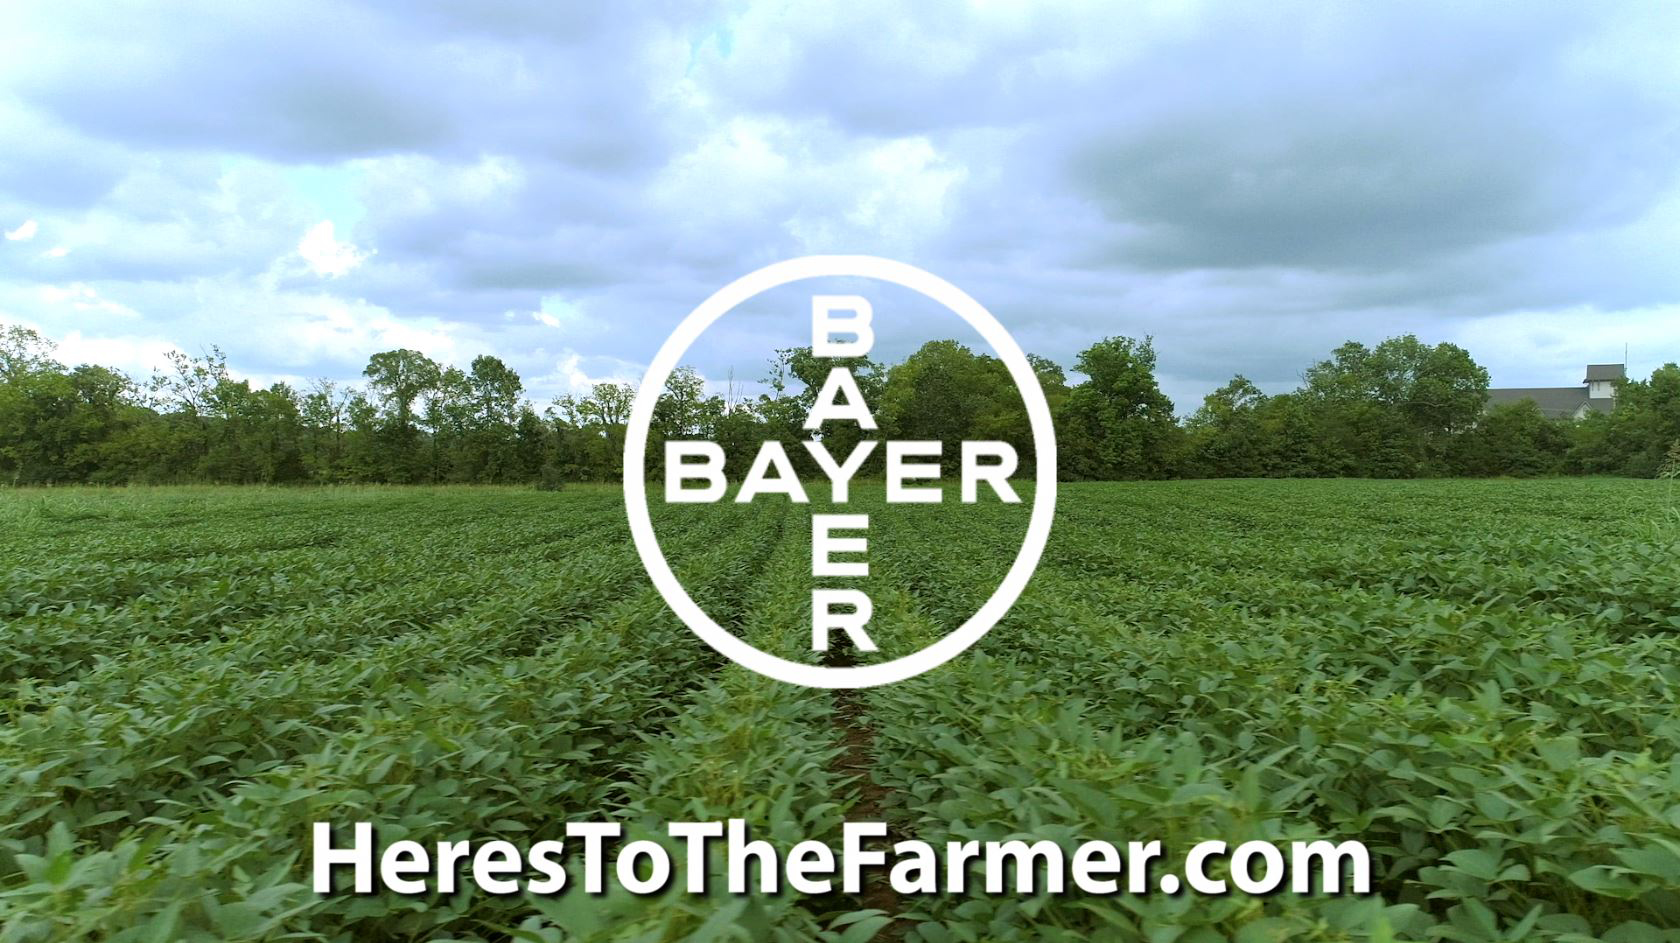 Bayer and Luke Bryan: #HeresToTheFarmer